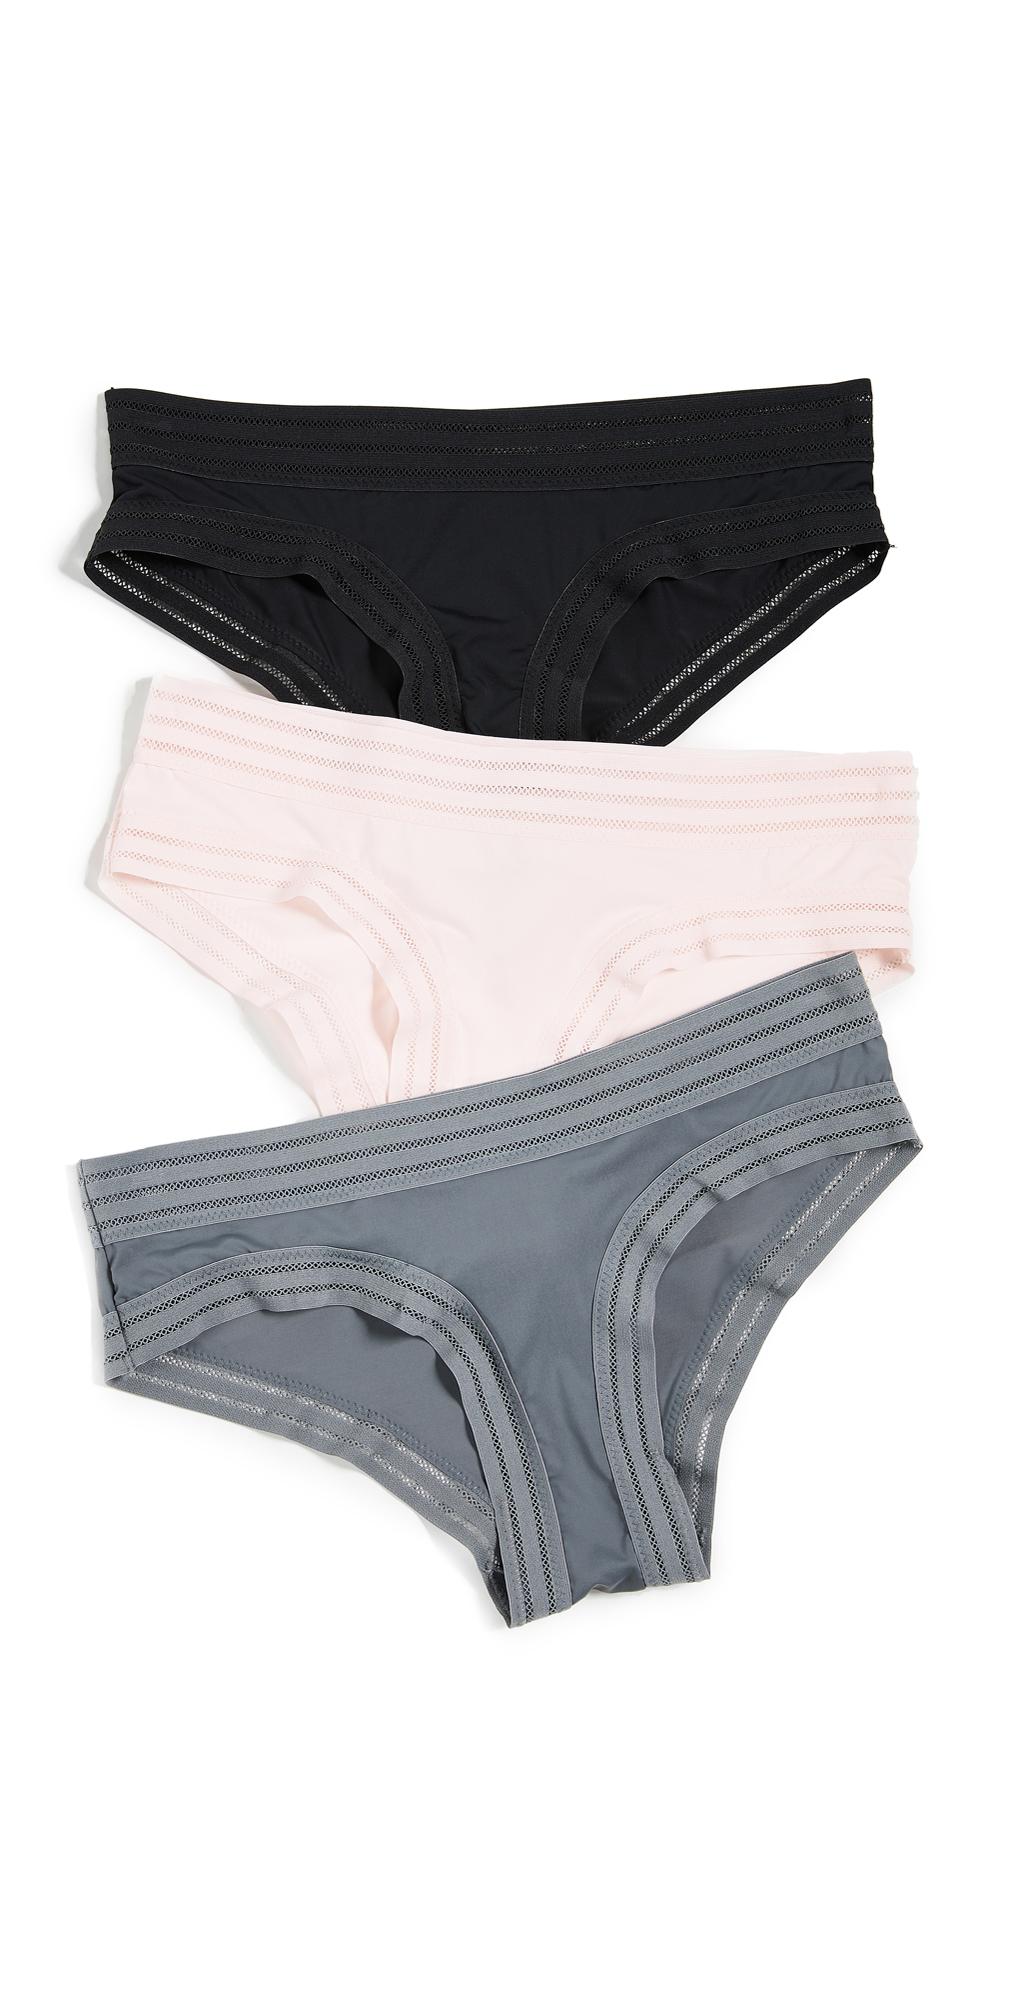 Honeydew Intimates Micki 3 Pack Hipster Panties